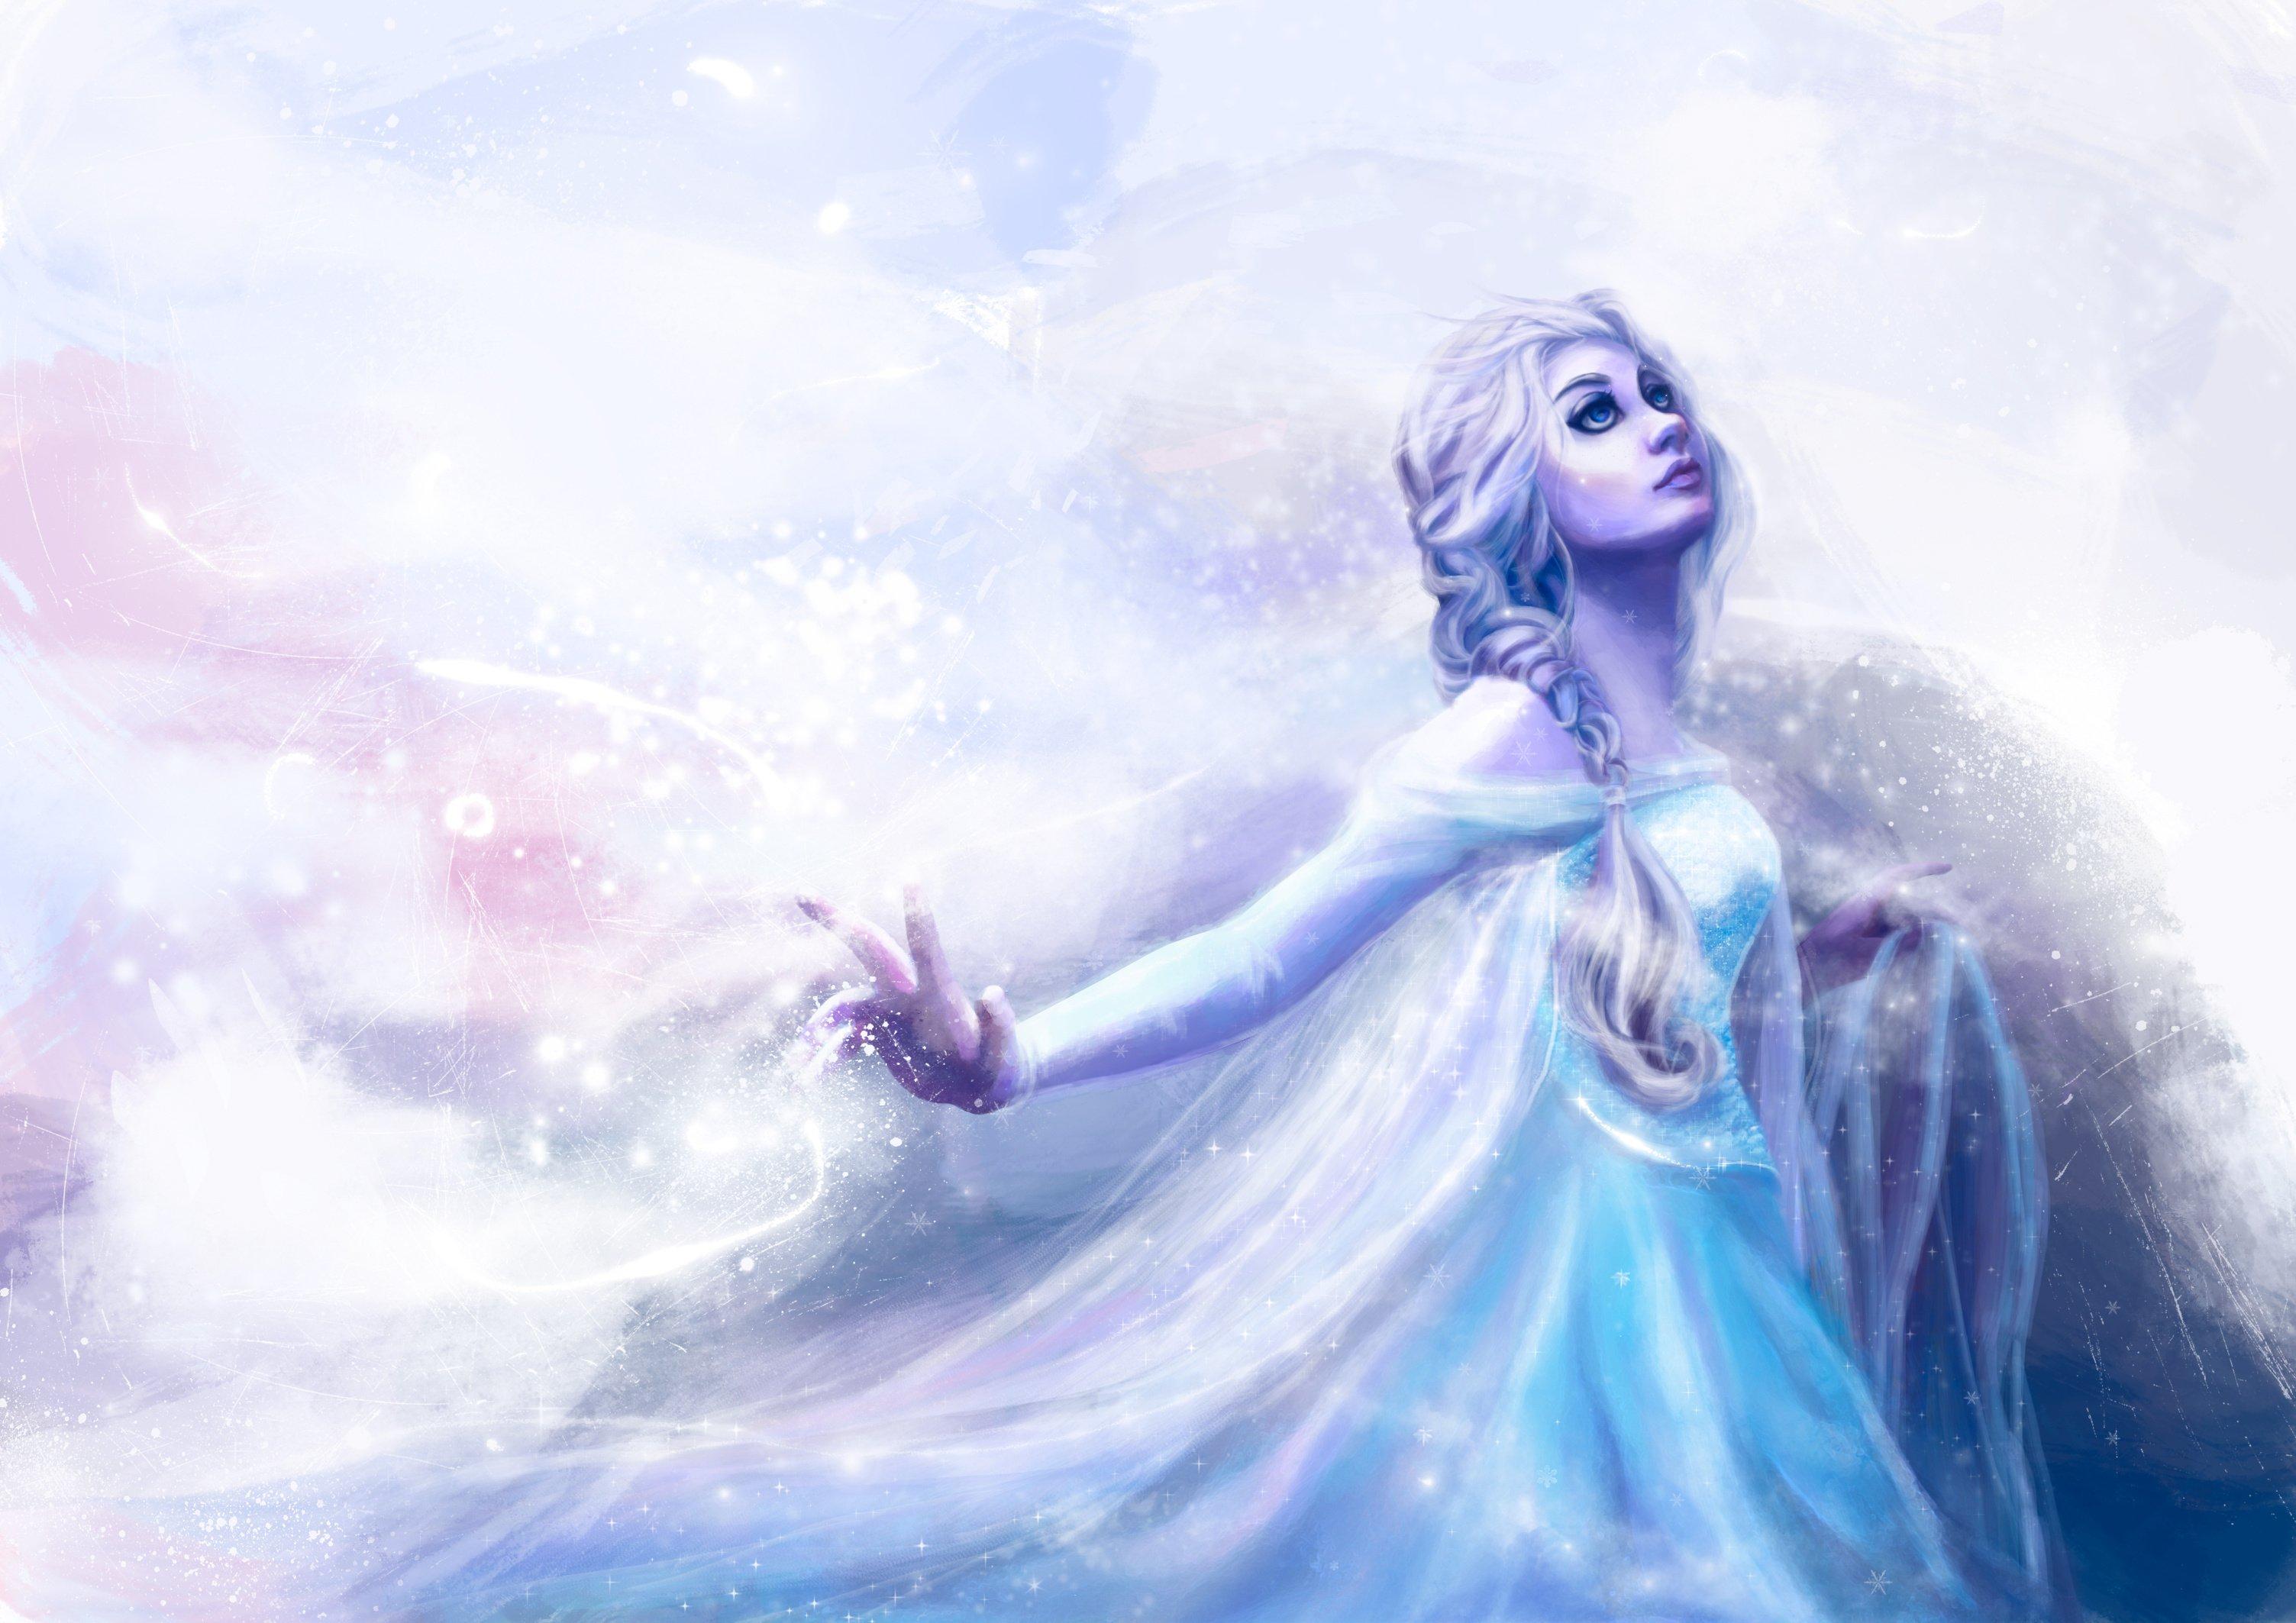 Elsa Frozen Frozen Movie 3007x2126